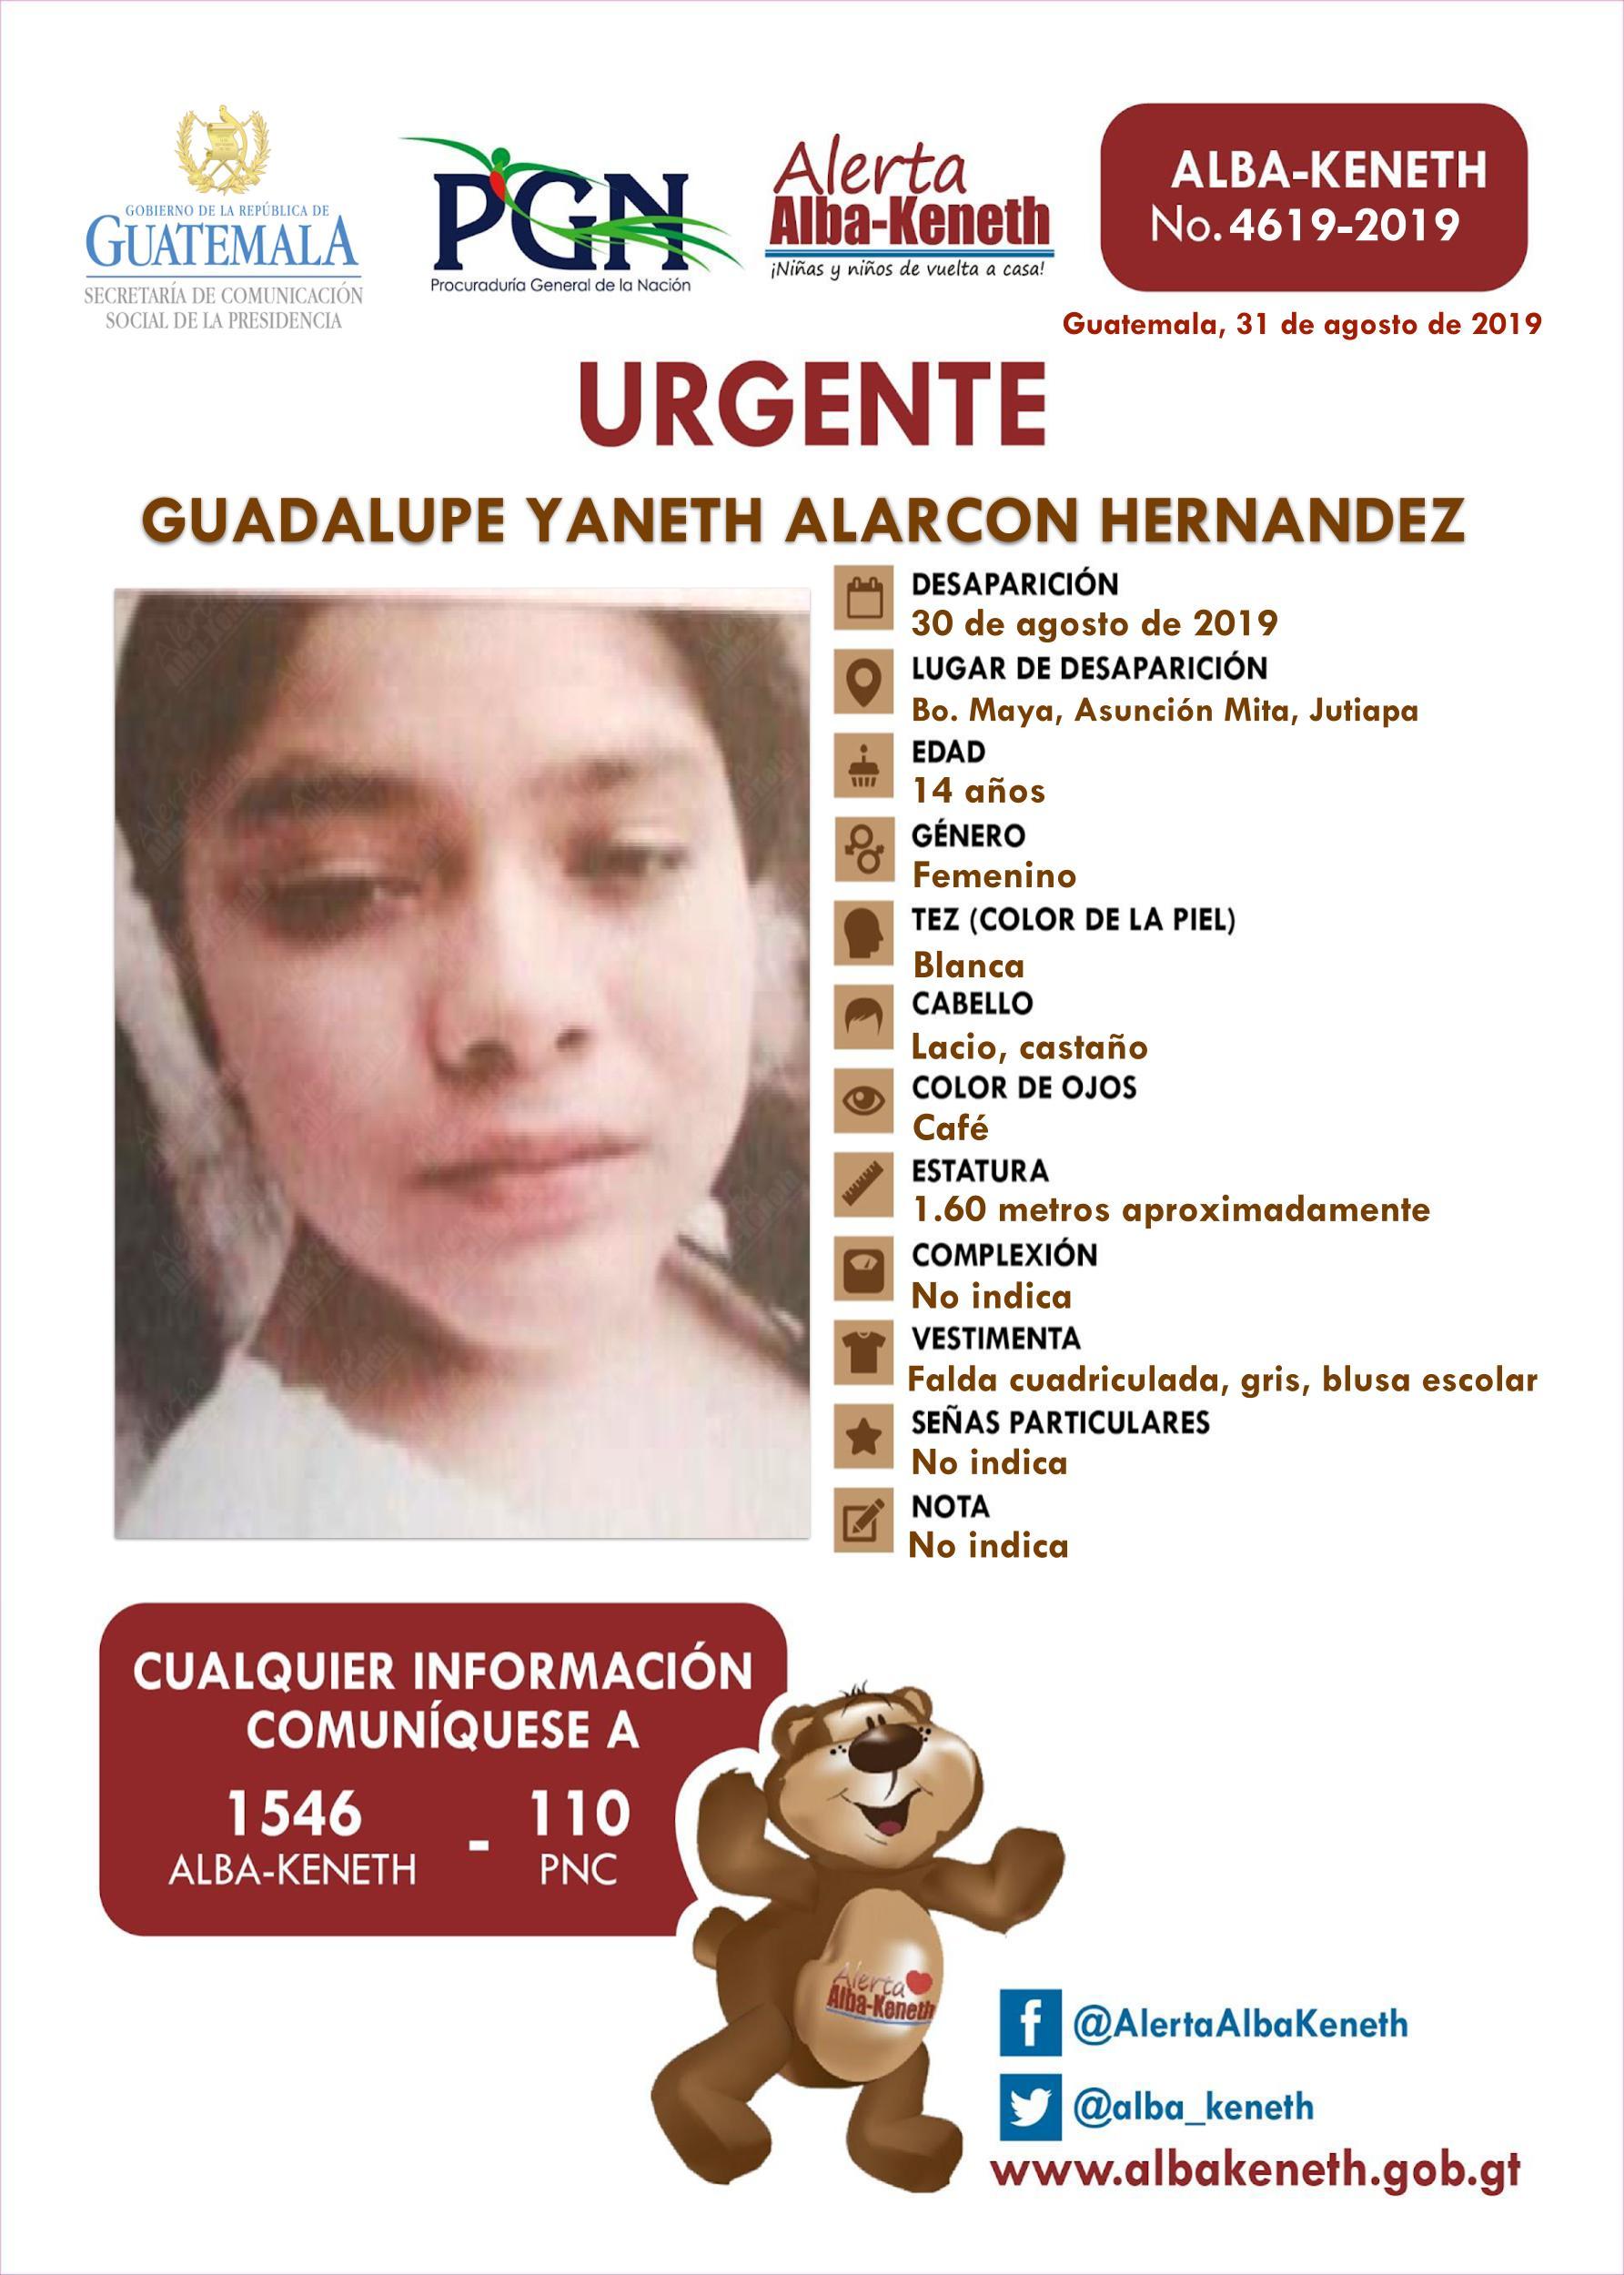 Guadalupe Yaneth Alarcon Hernandez